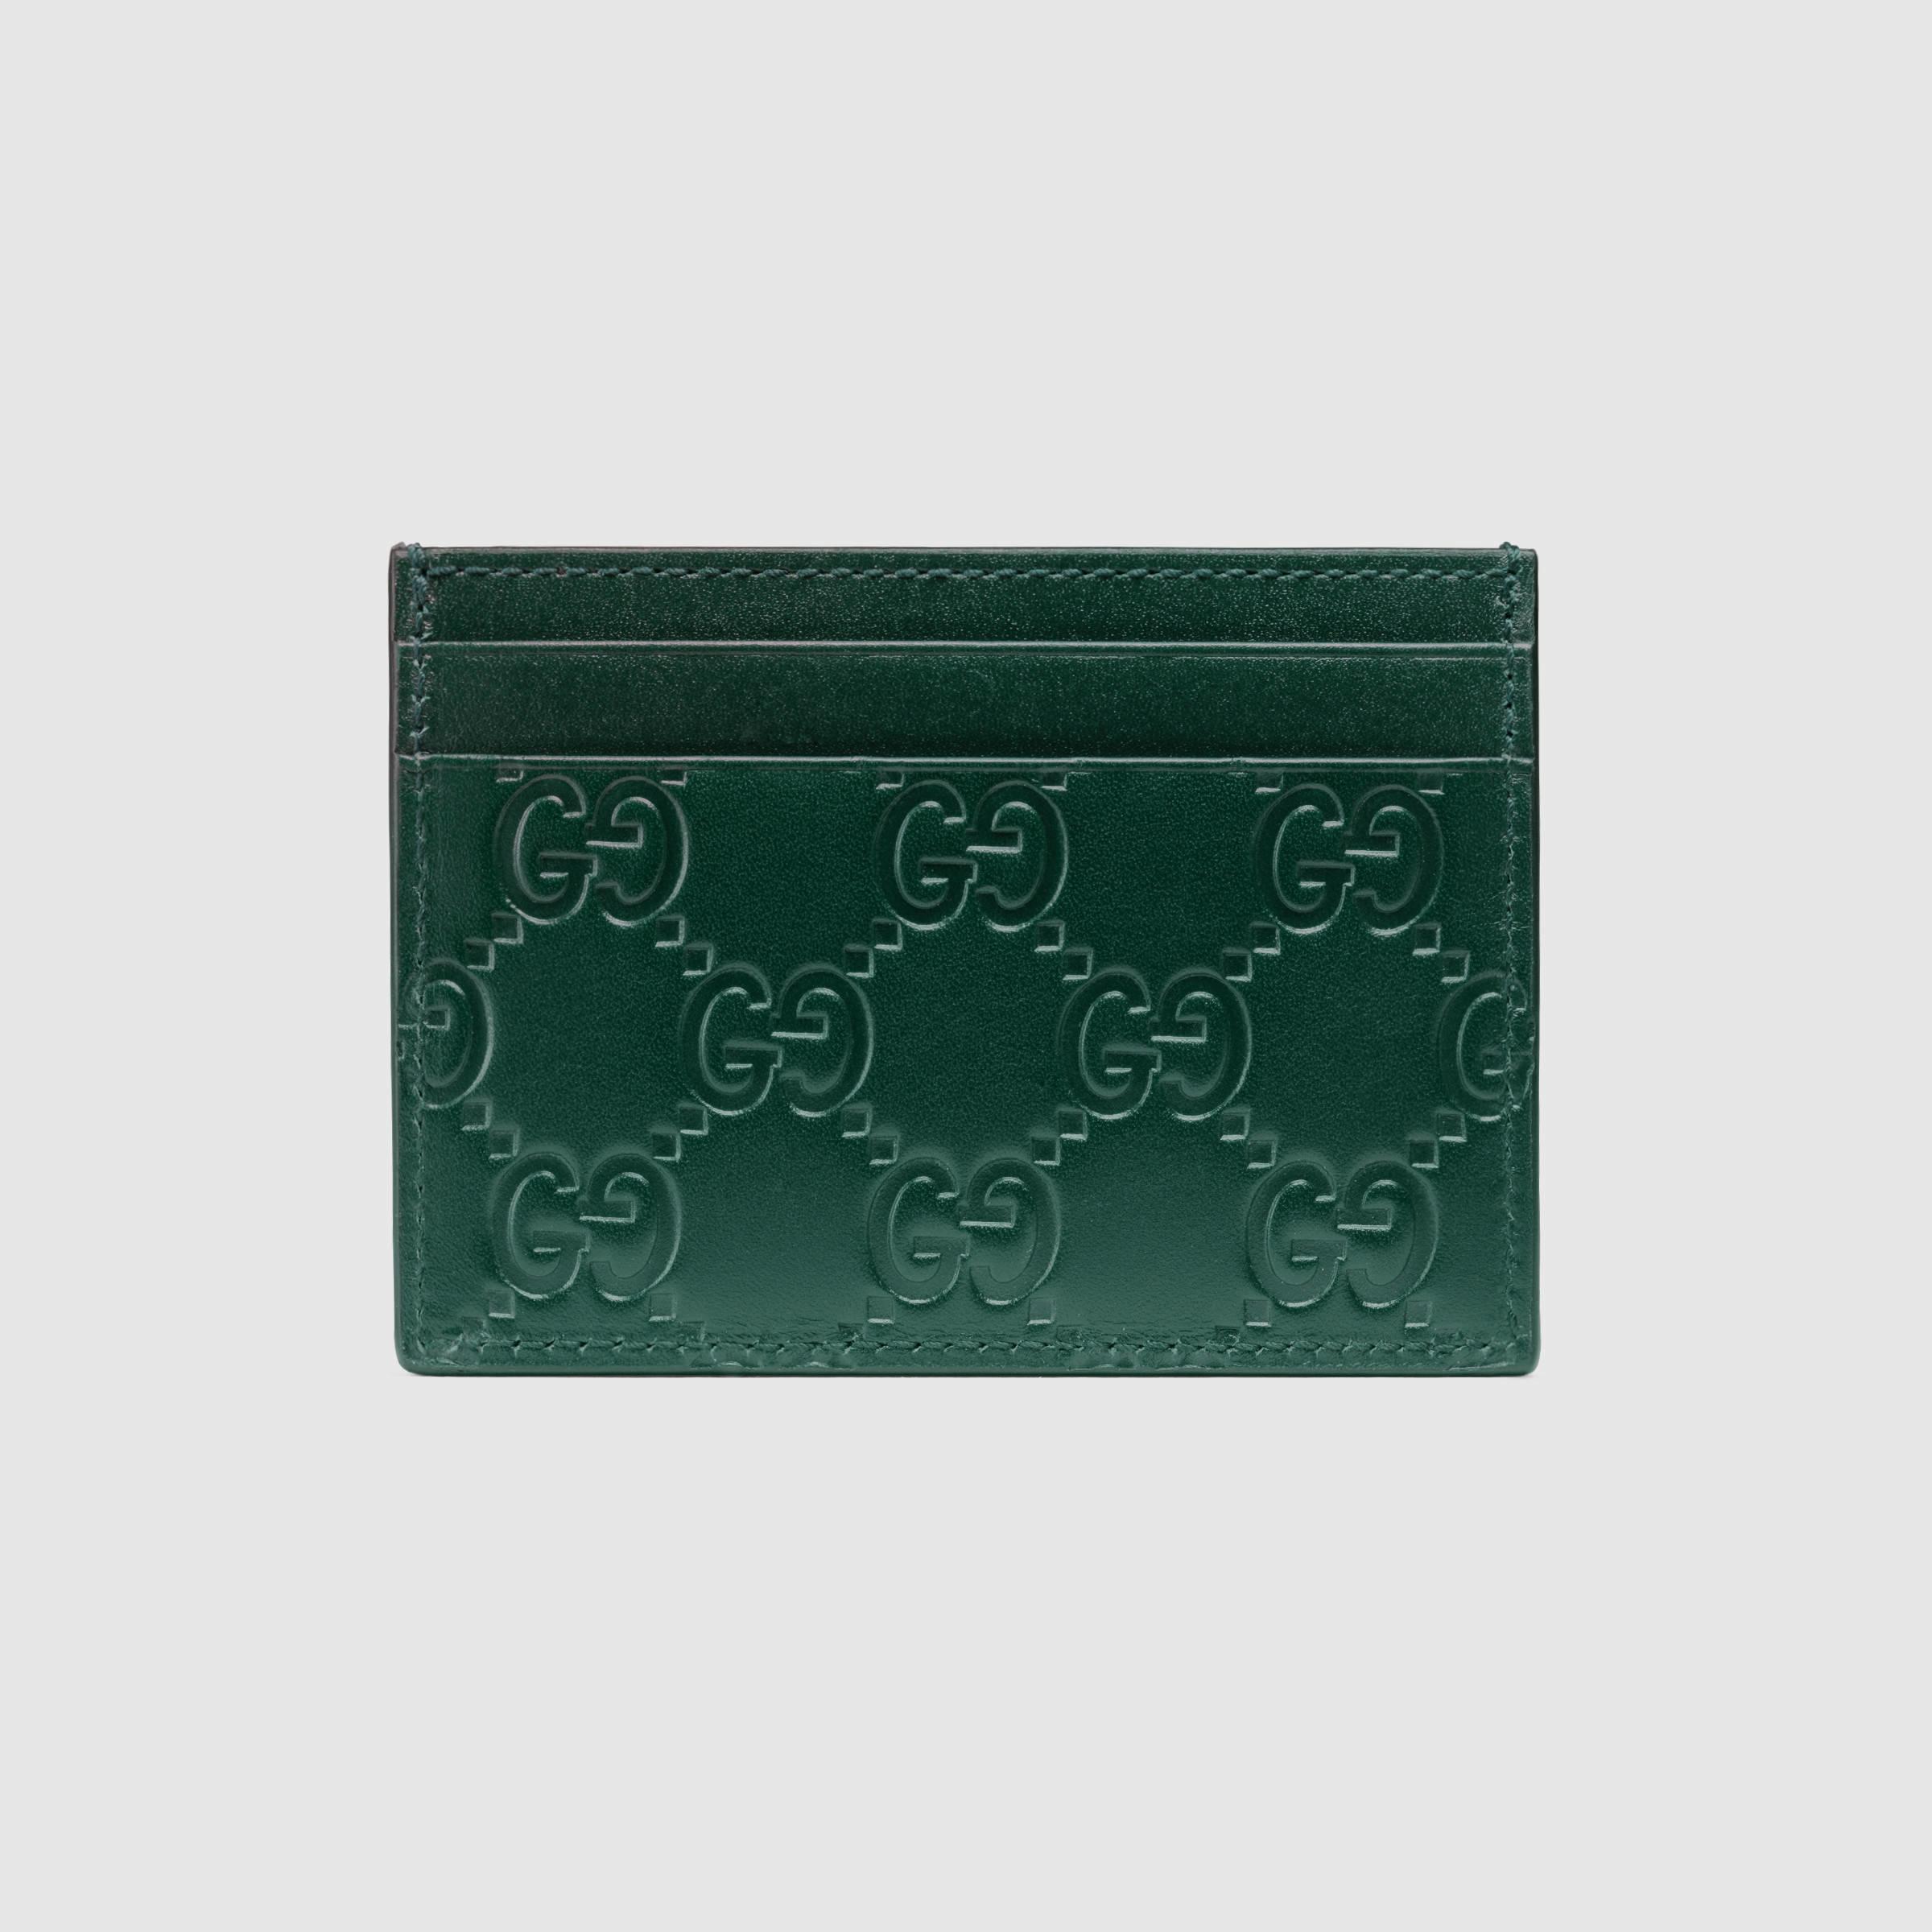 4739d682c6229 Gucci Signature Card Case Price